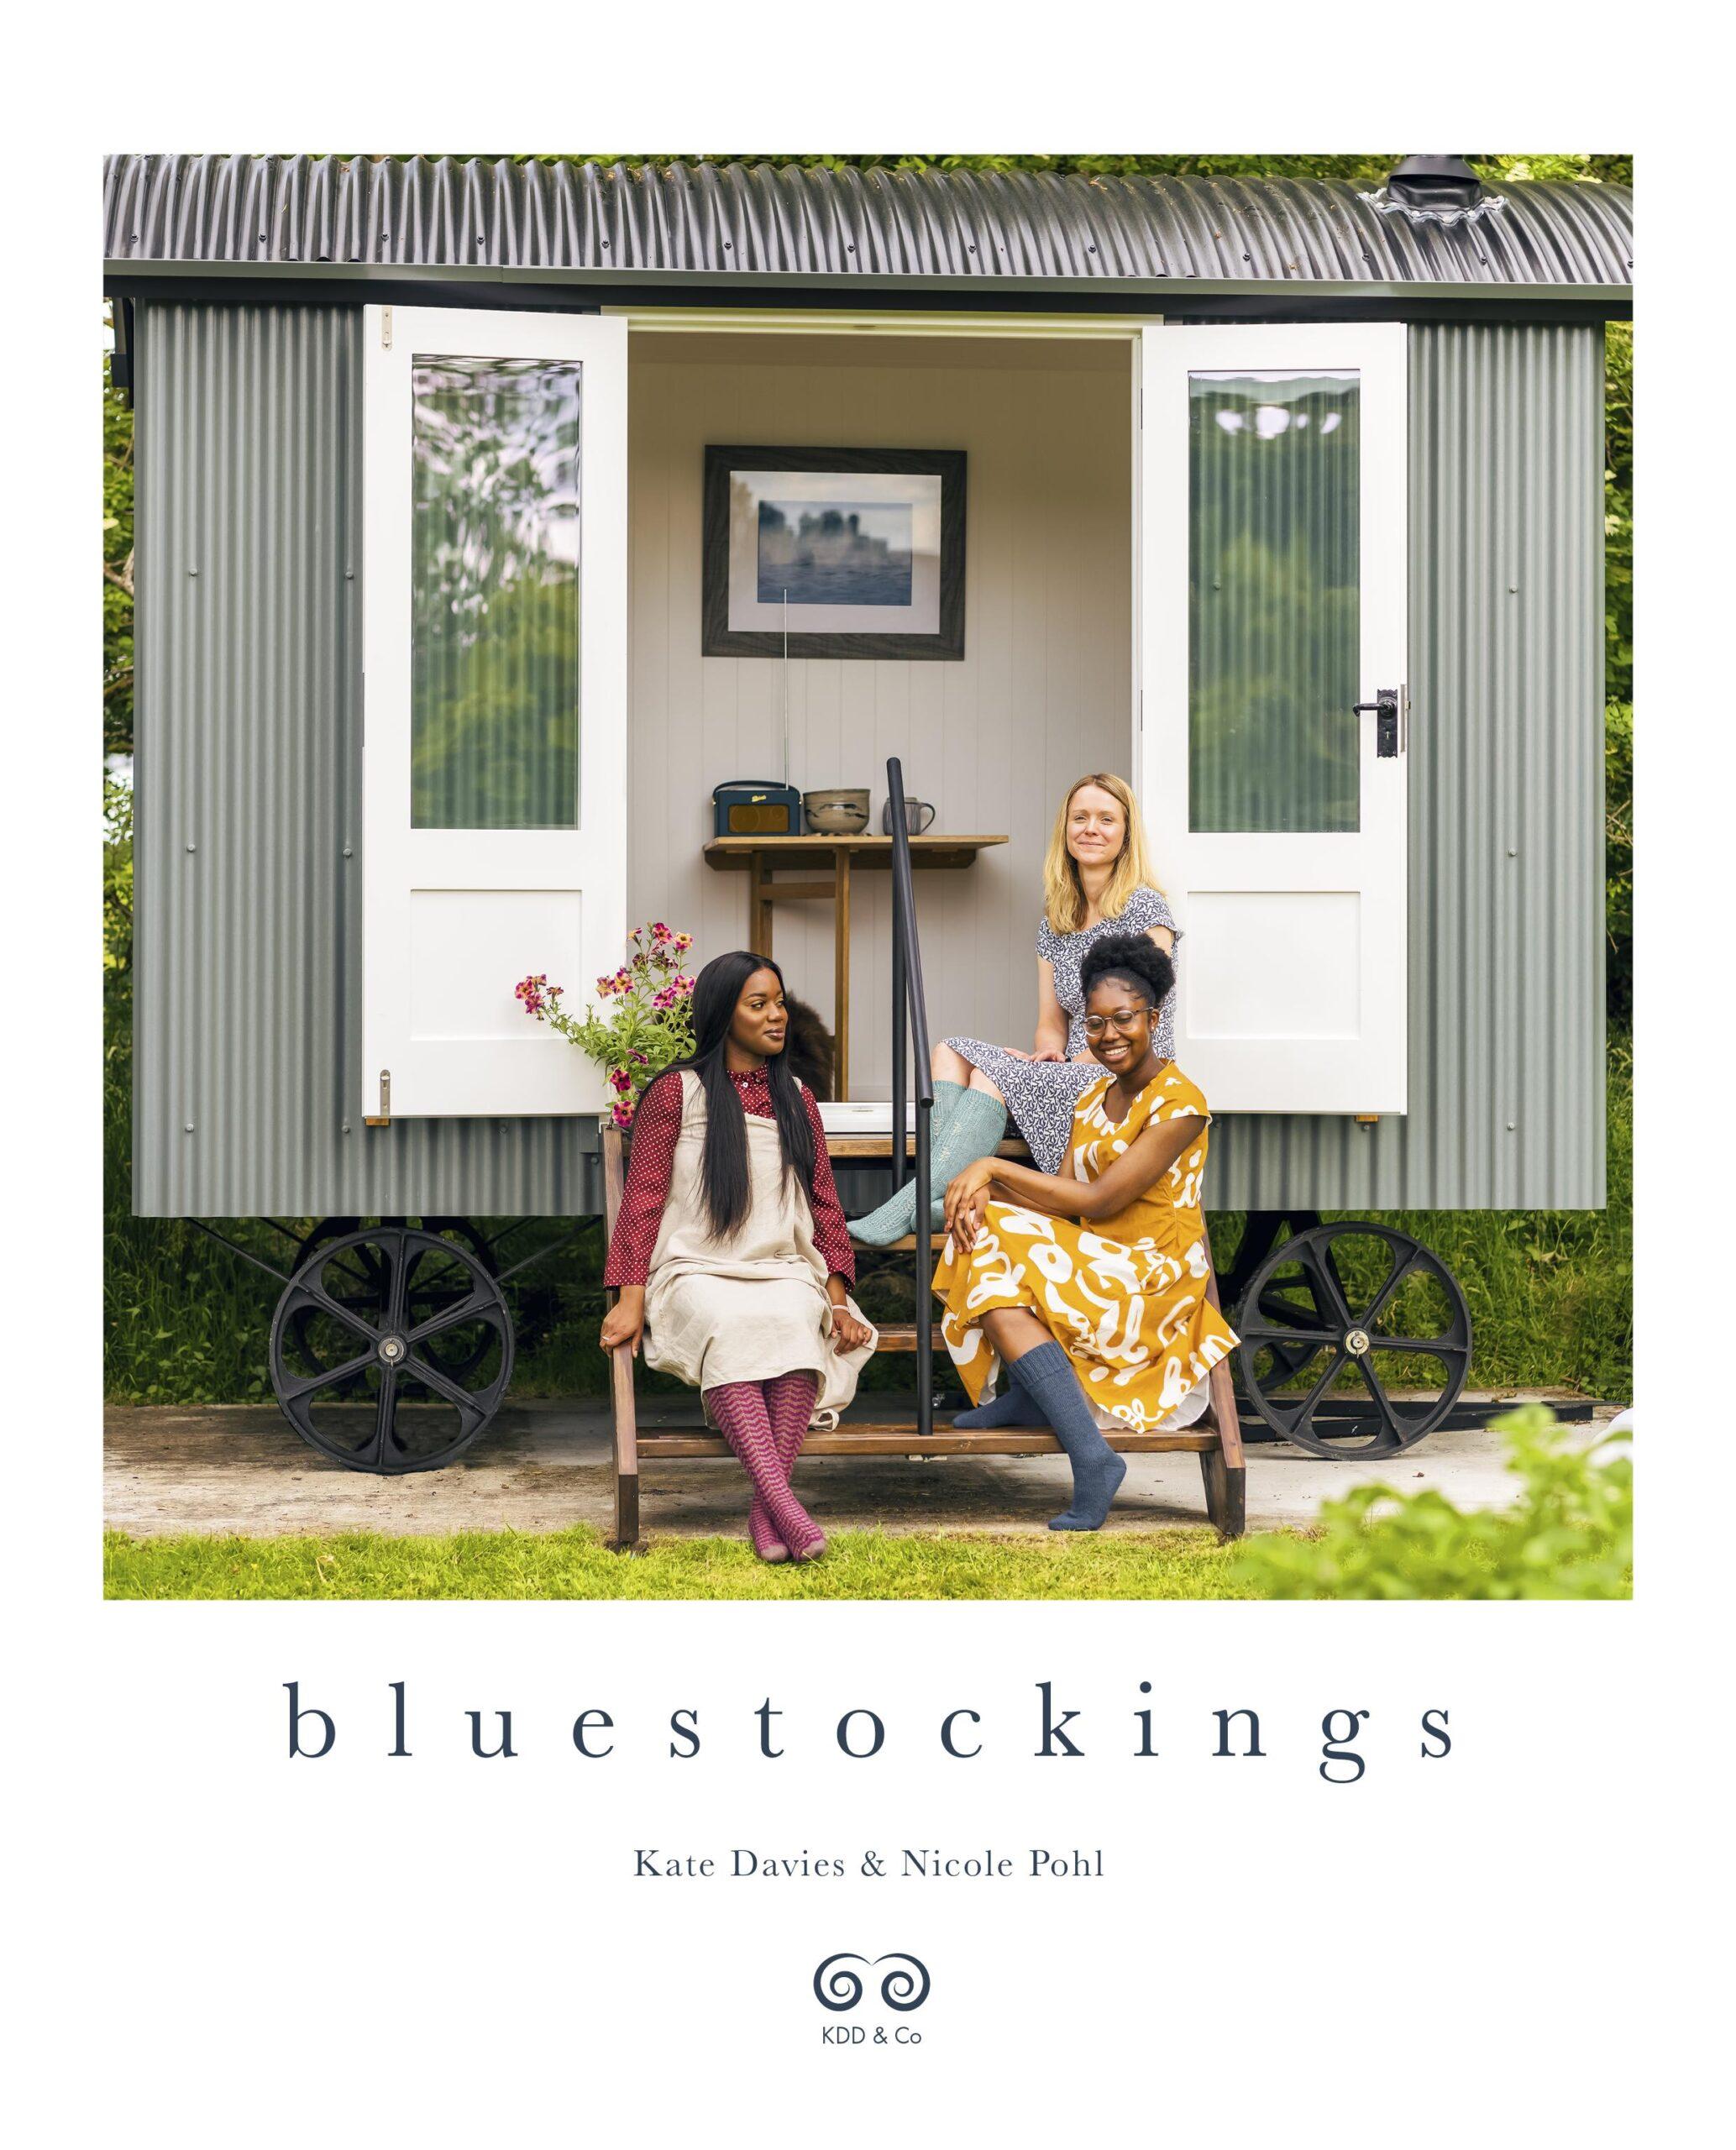 Bluestockings Kate Davies de Afstap Amsterdam